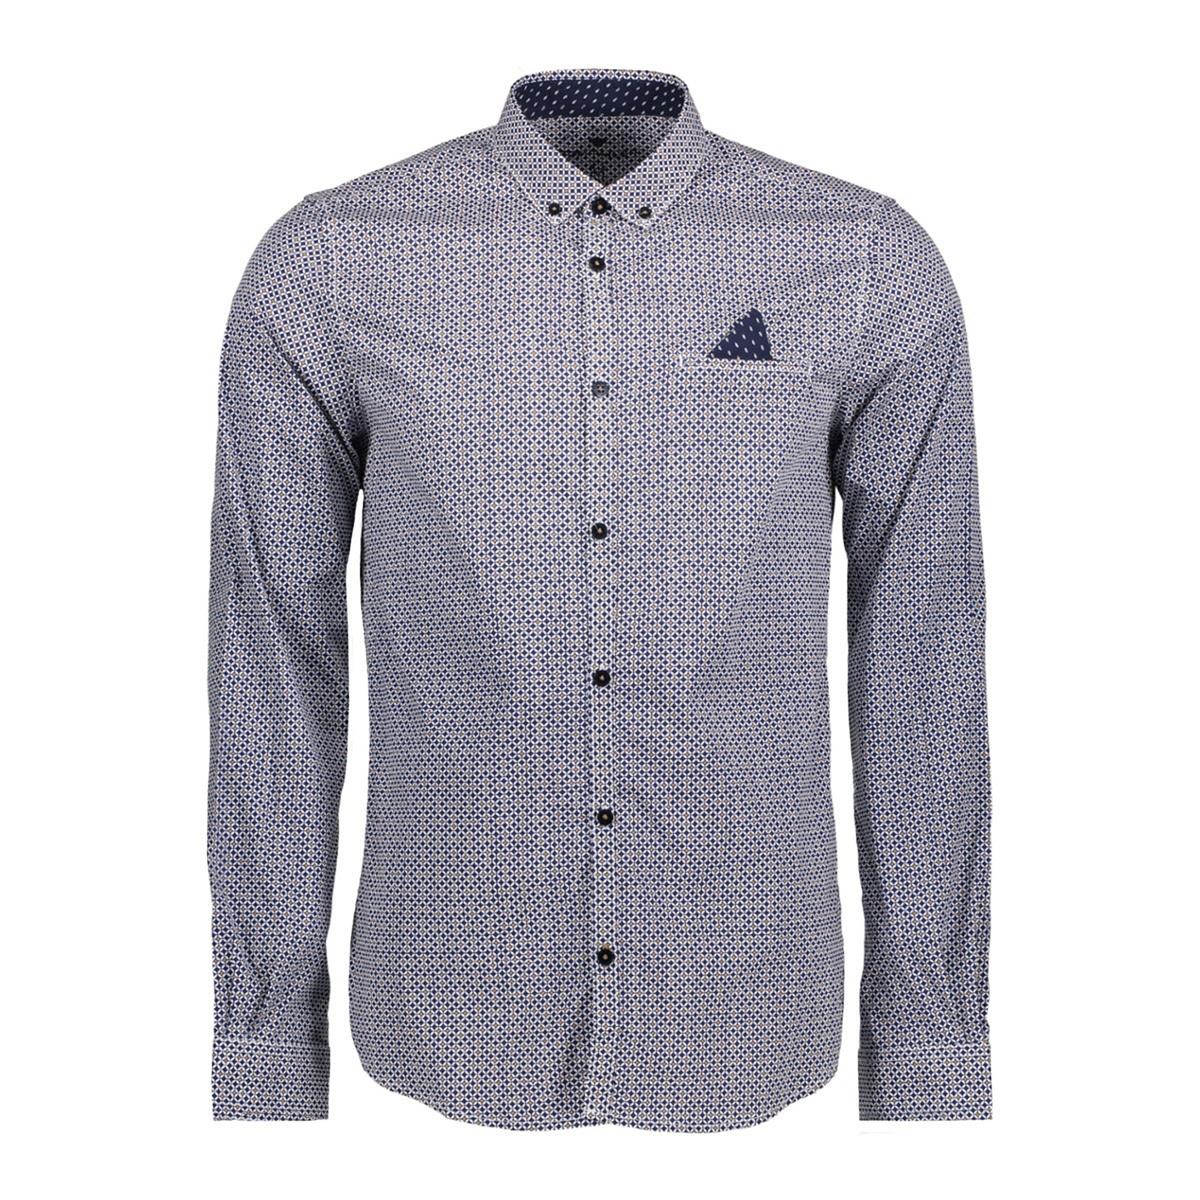 Рубашка узкого покроя с рисунком